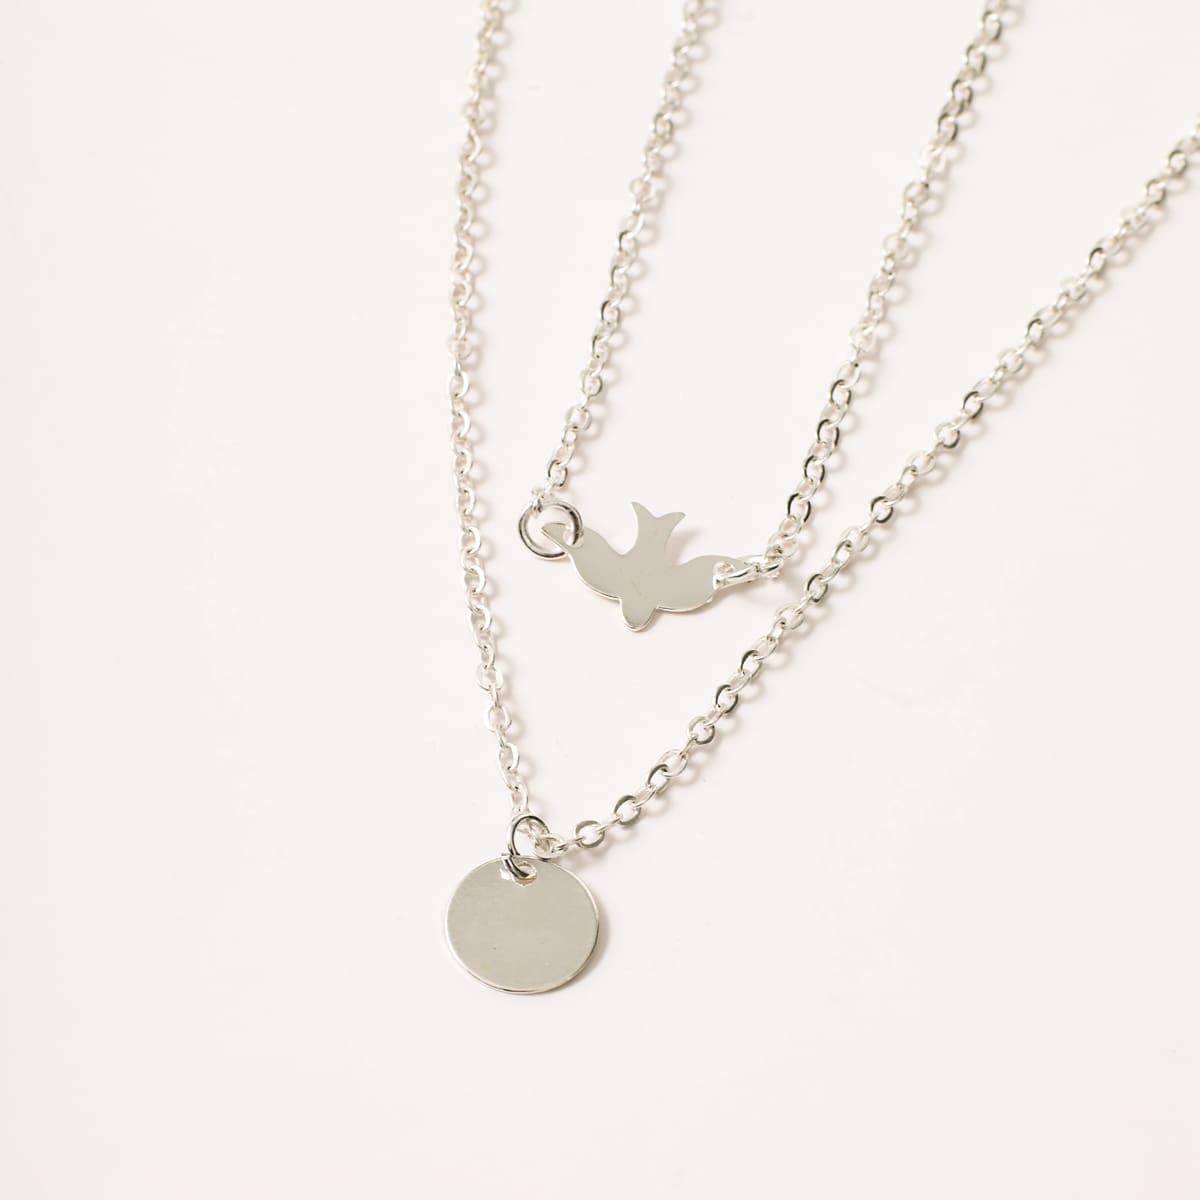 1pc Swallow & Disc Decor Layered Halskette